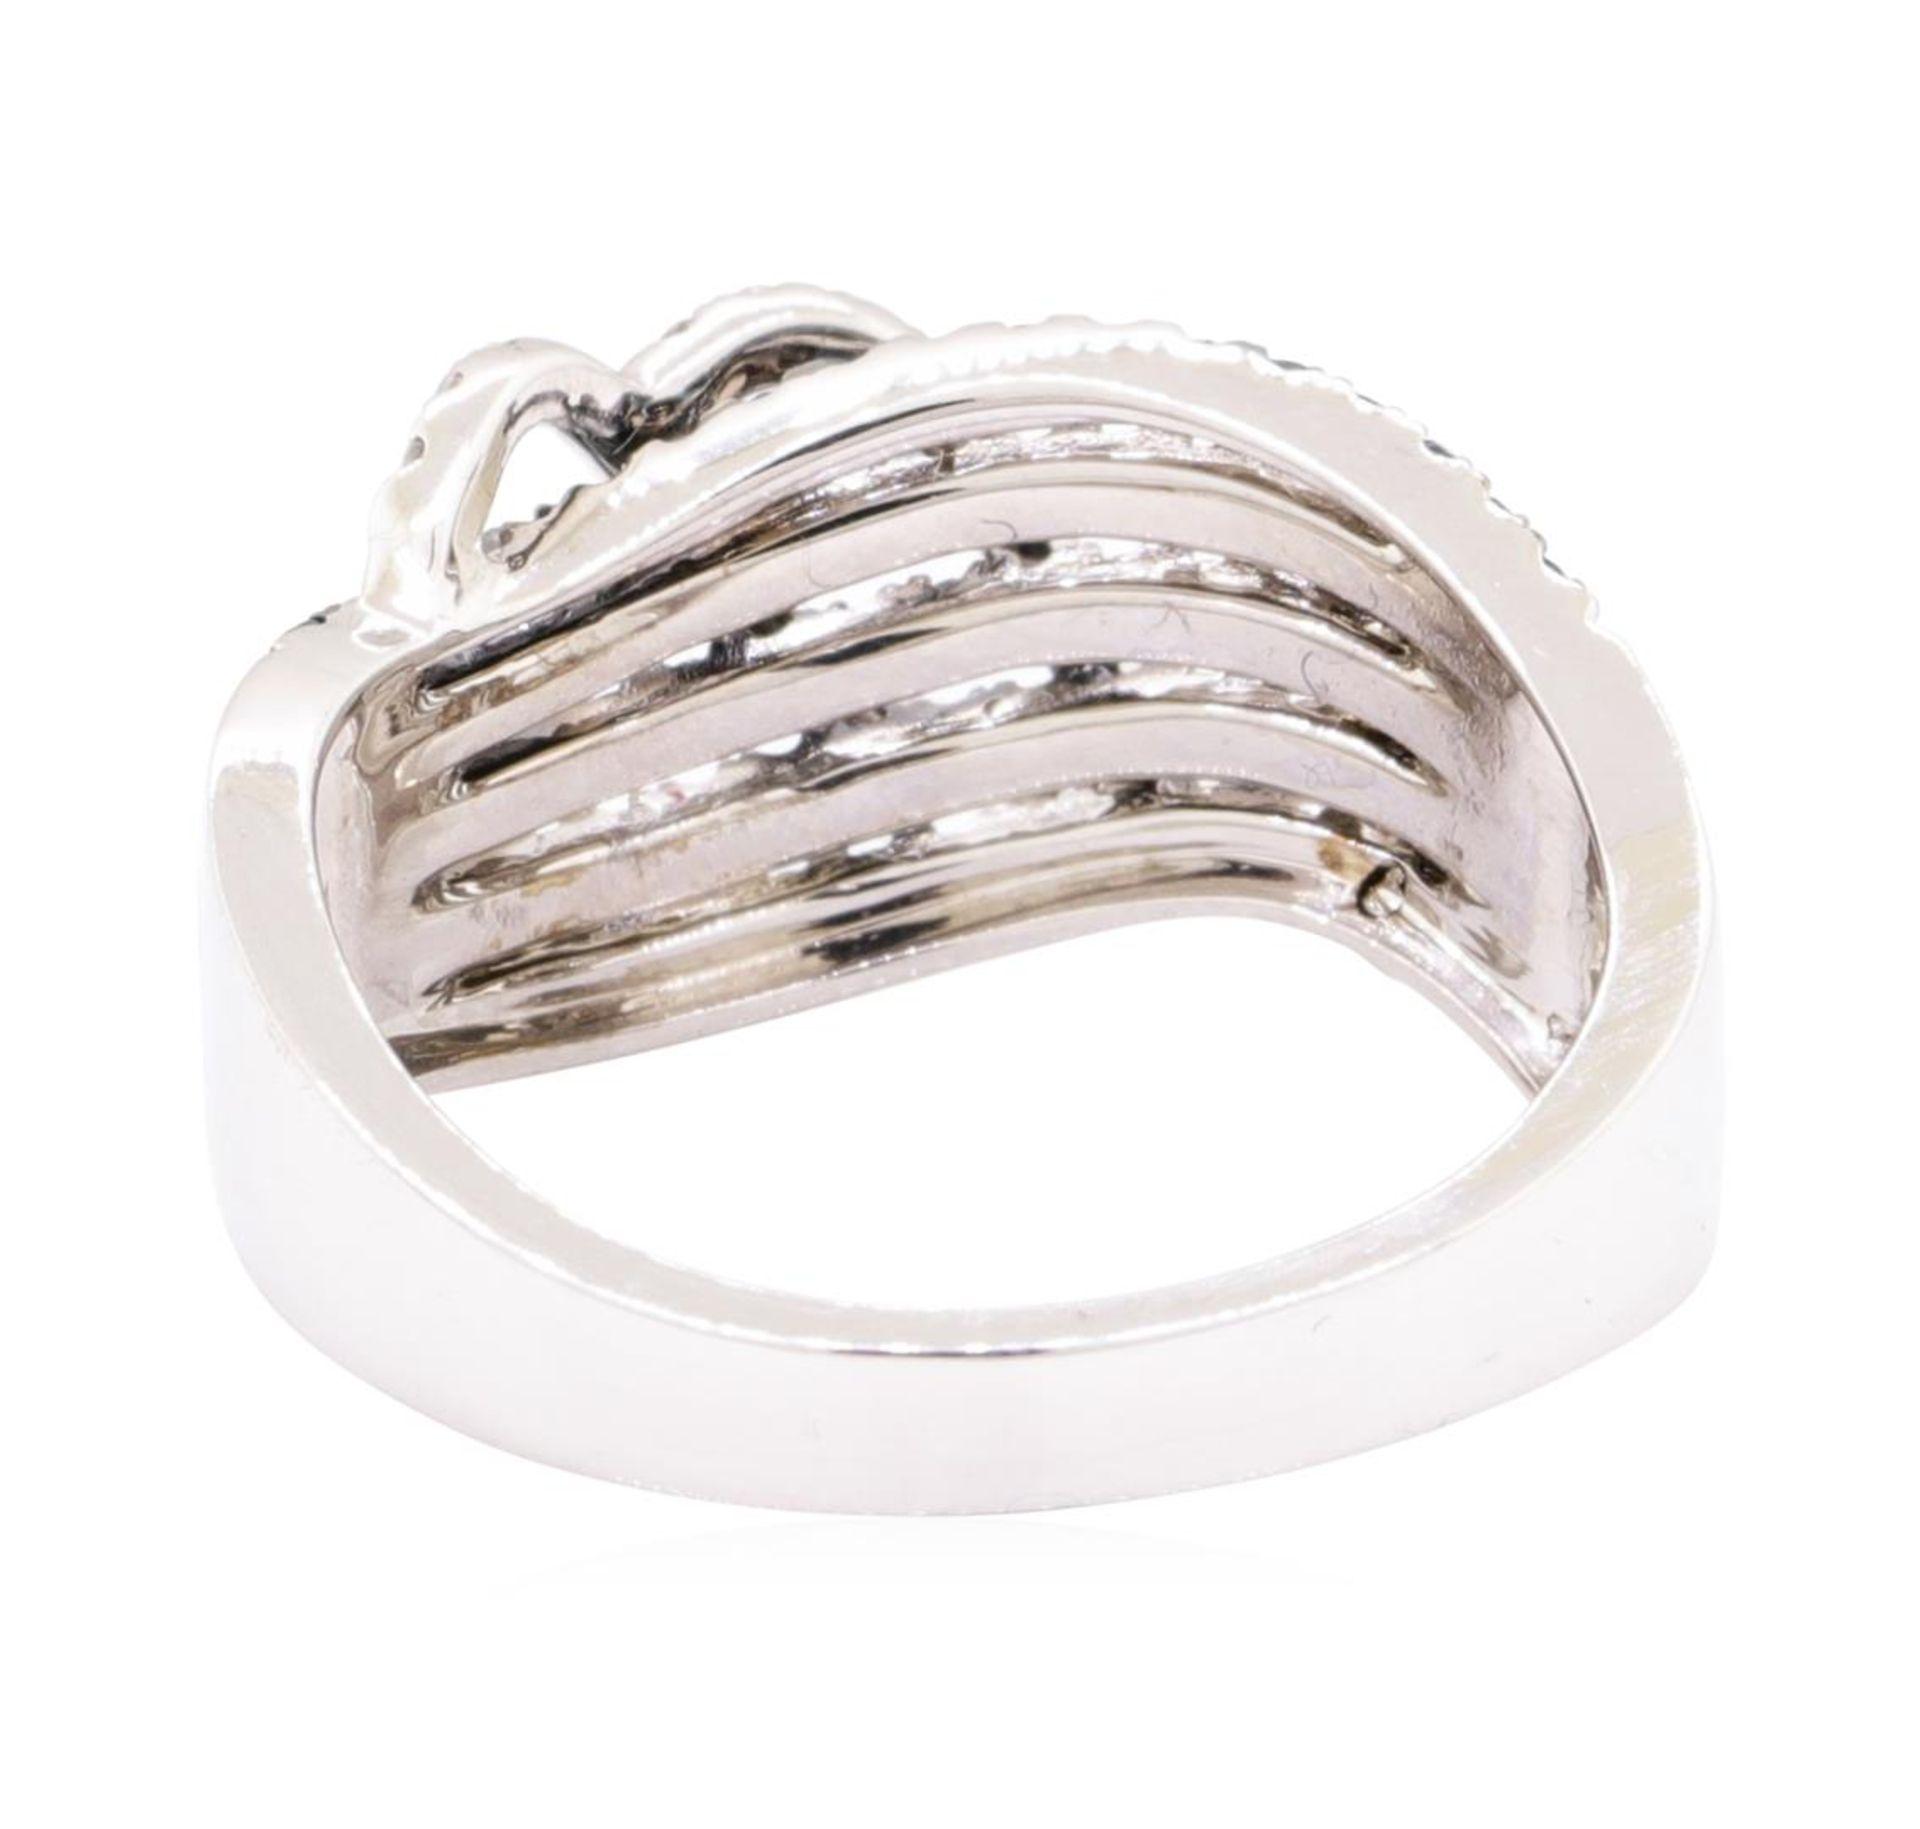 0.73 ctw Diamond Ring - 14KT White Gold - Image 3 of 5